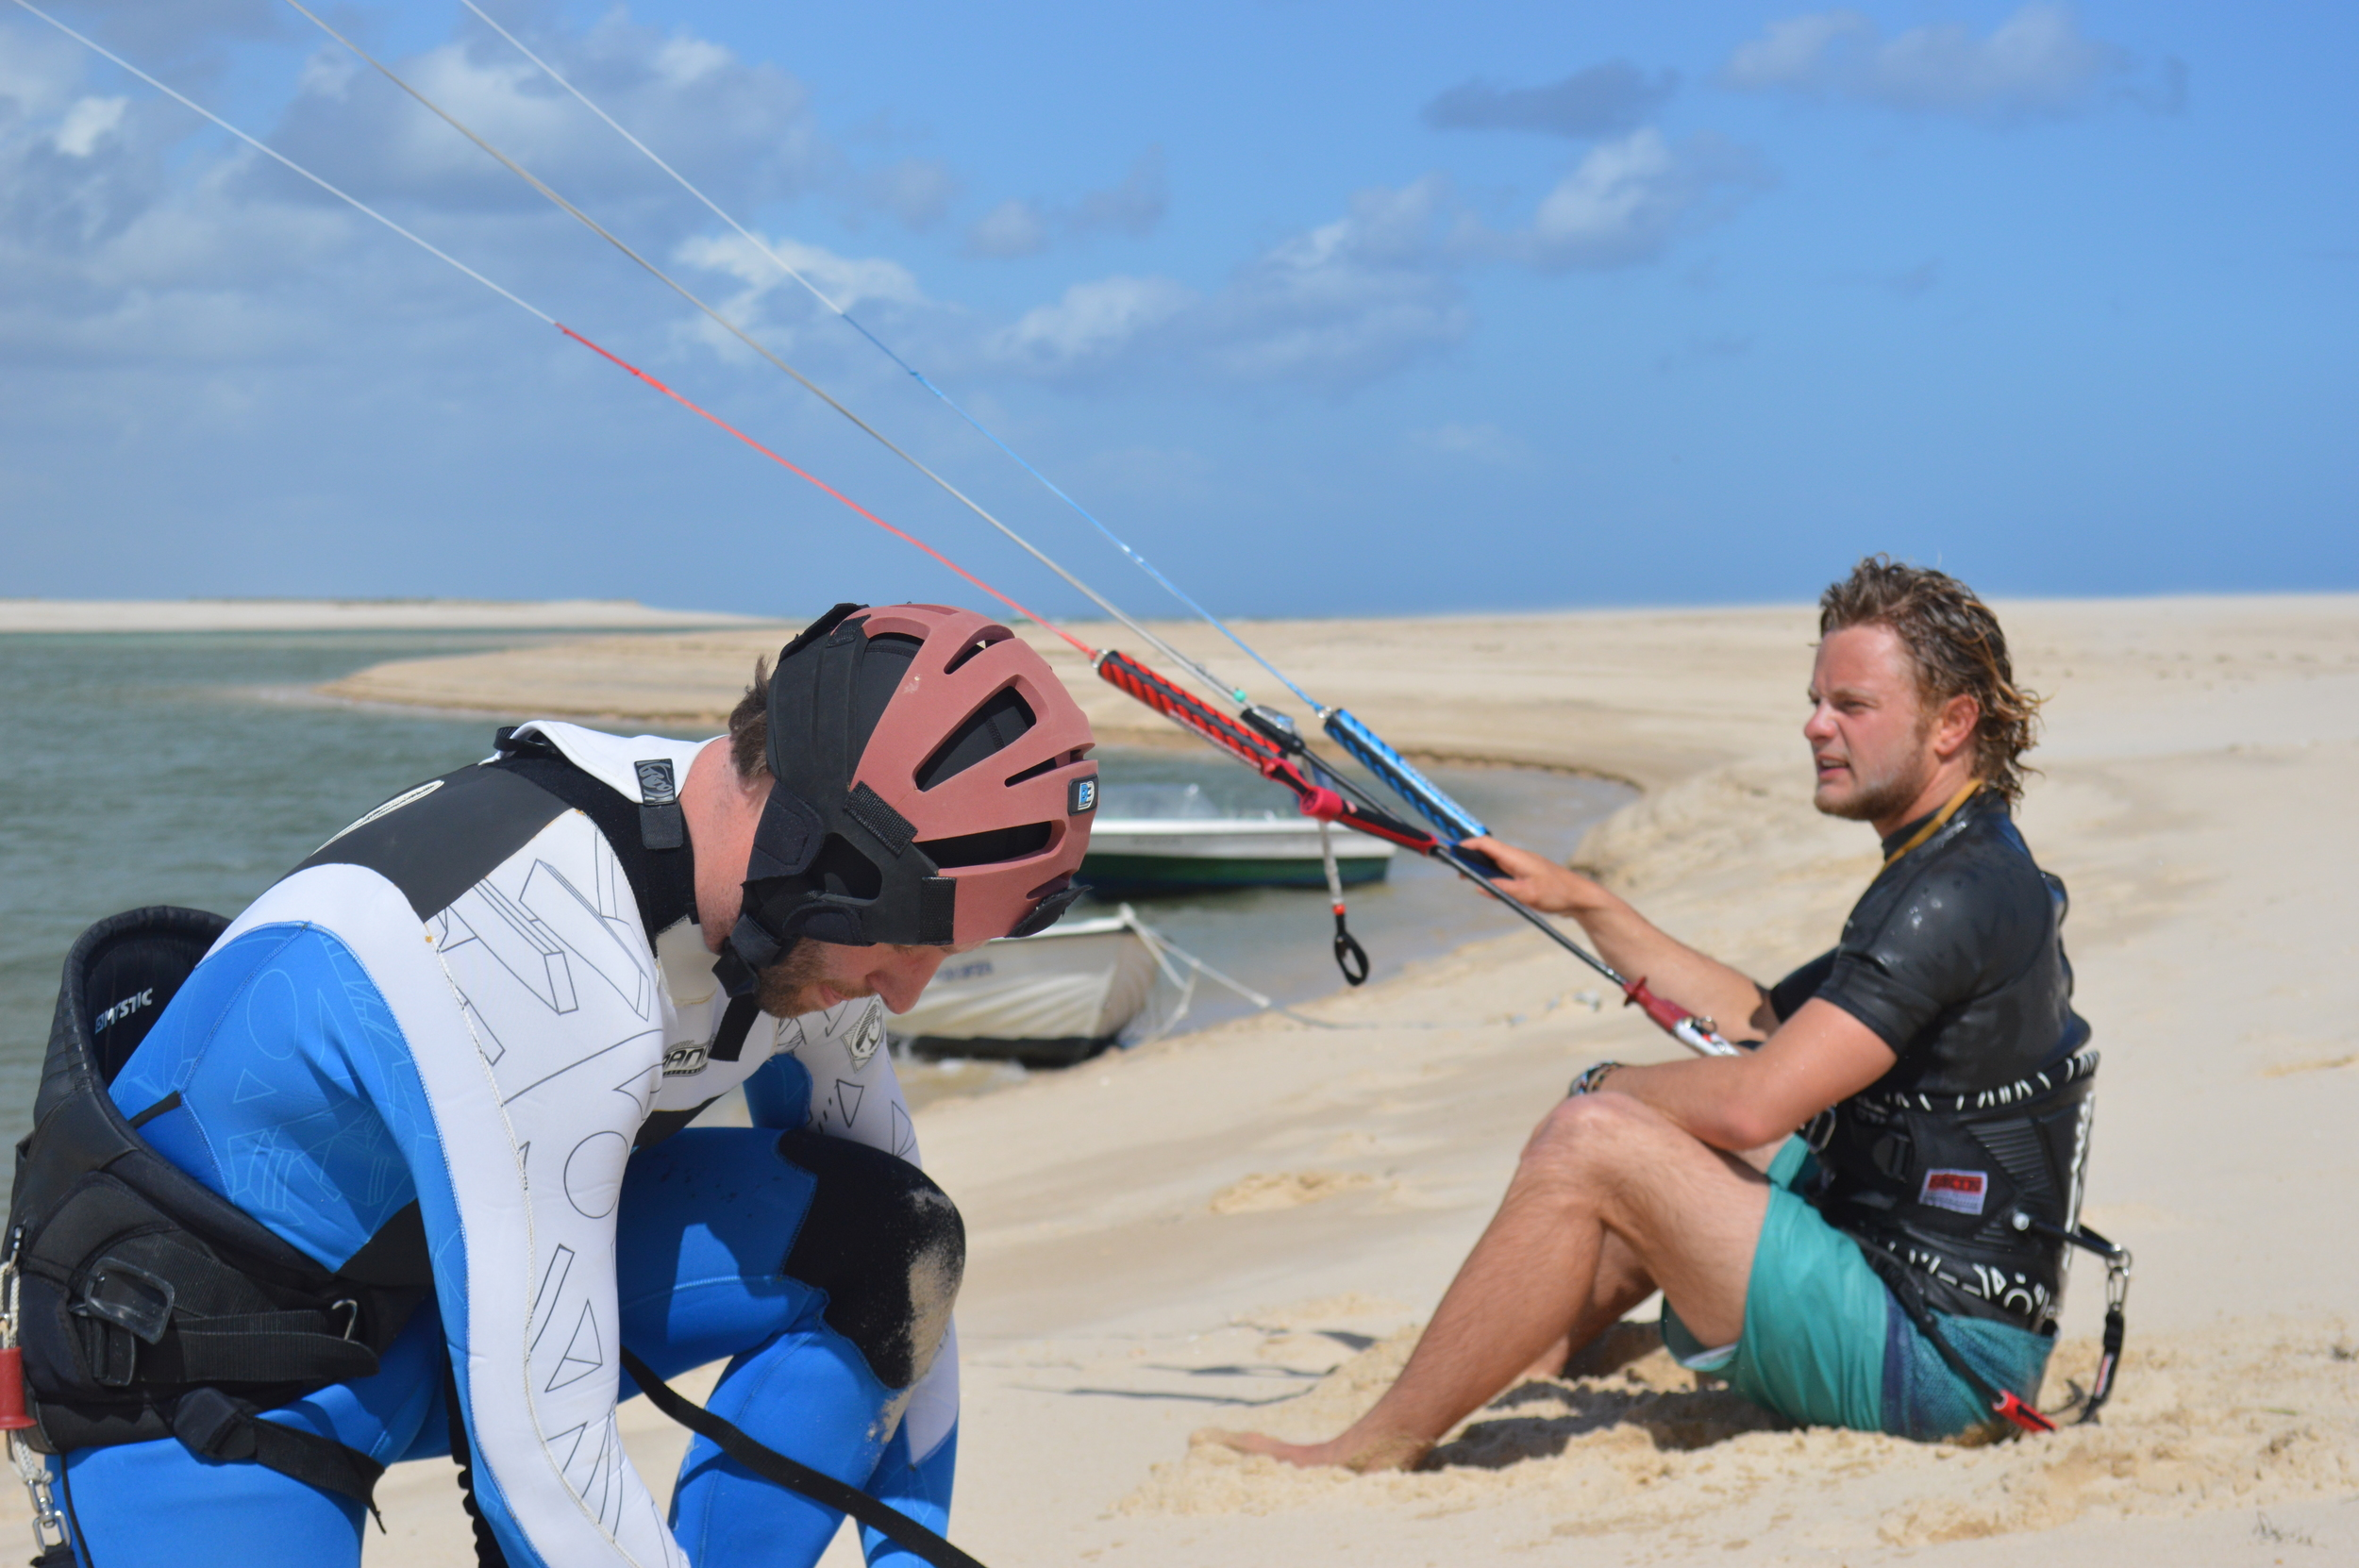 Getting ready to Kite Surf - Fuzeta beach